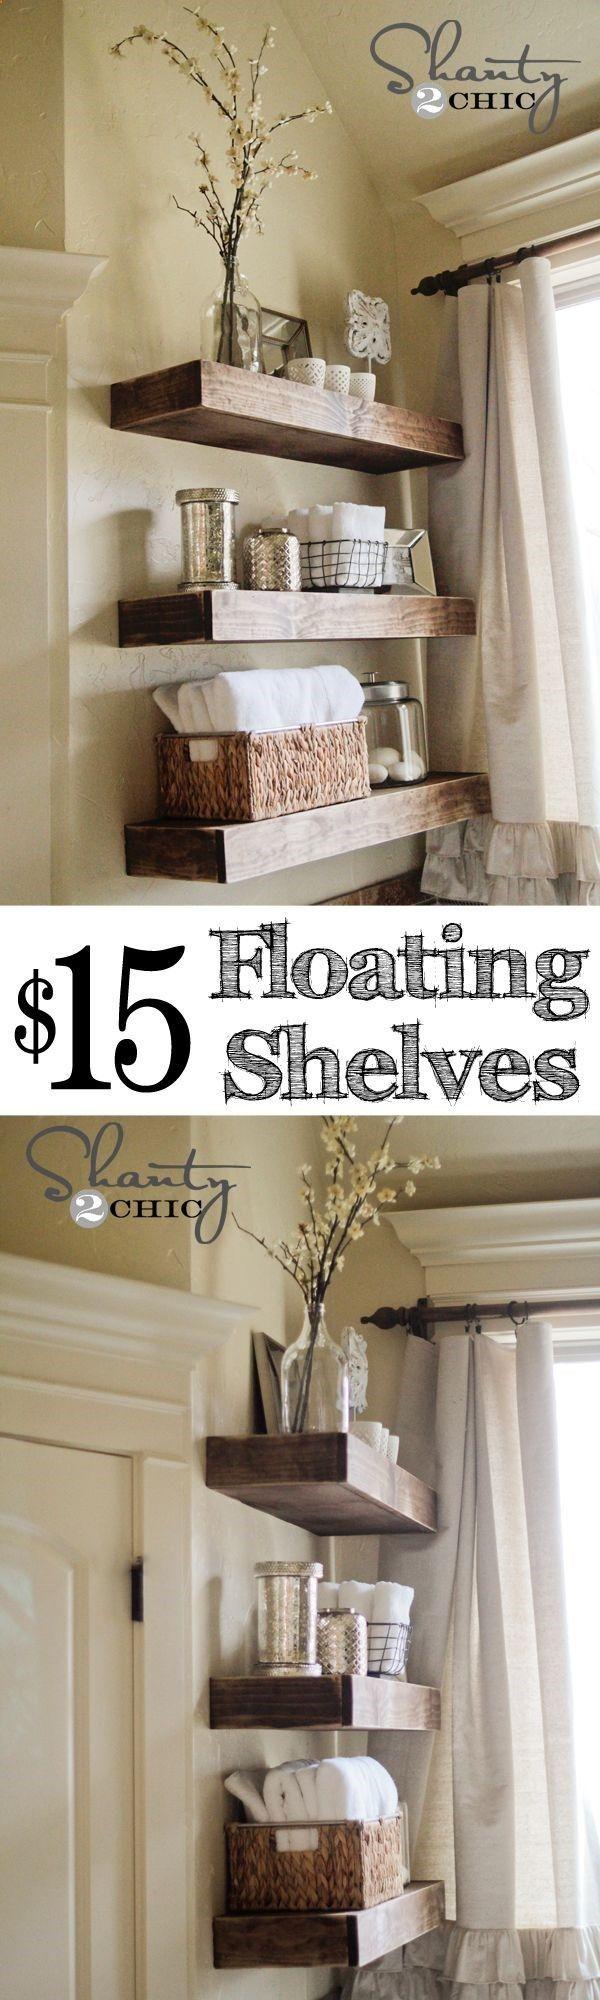 An easy DIY instructional for (cheap!) floating shelves